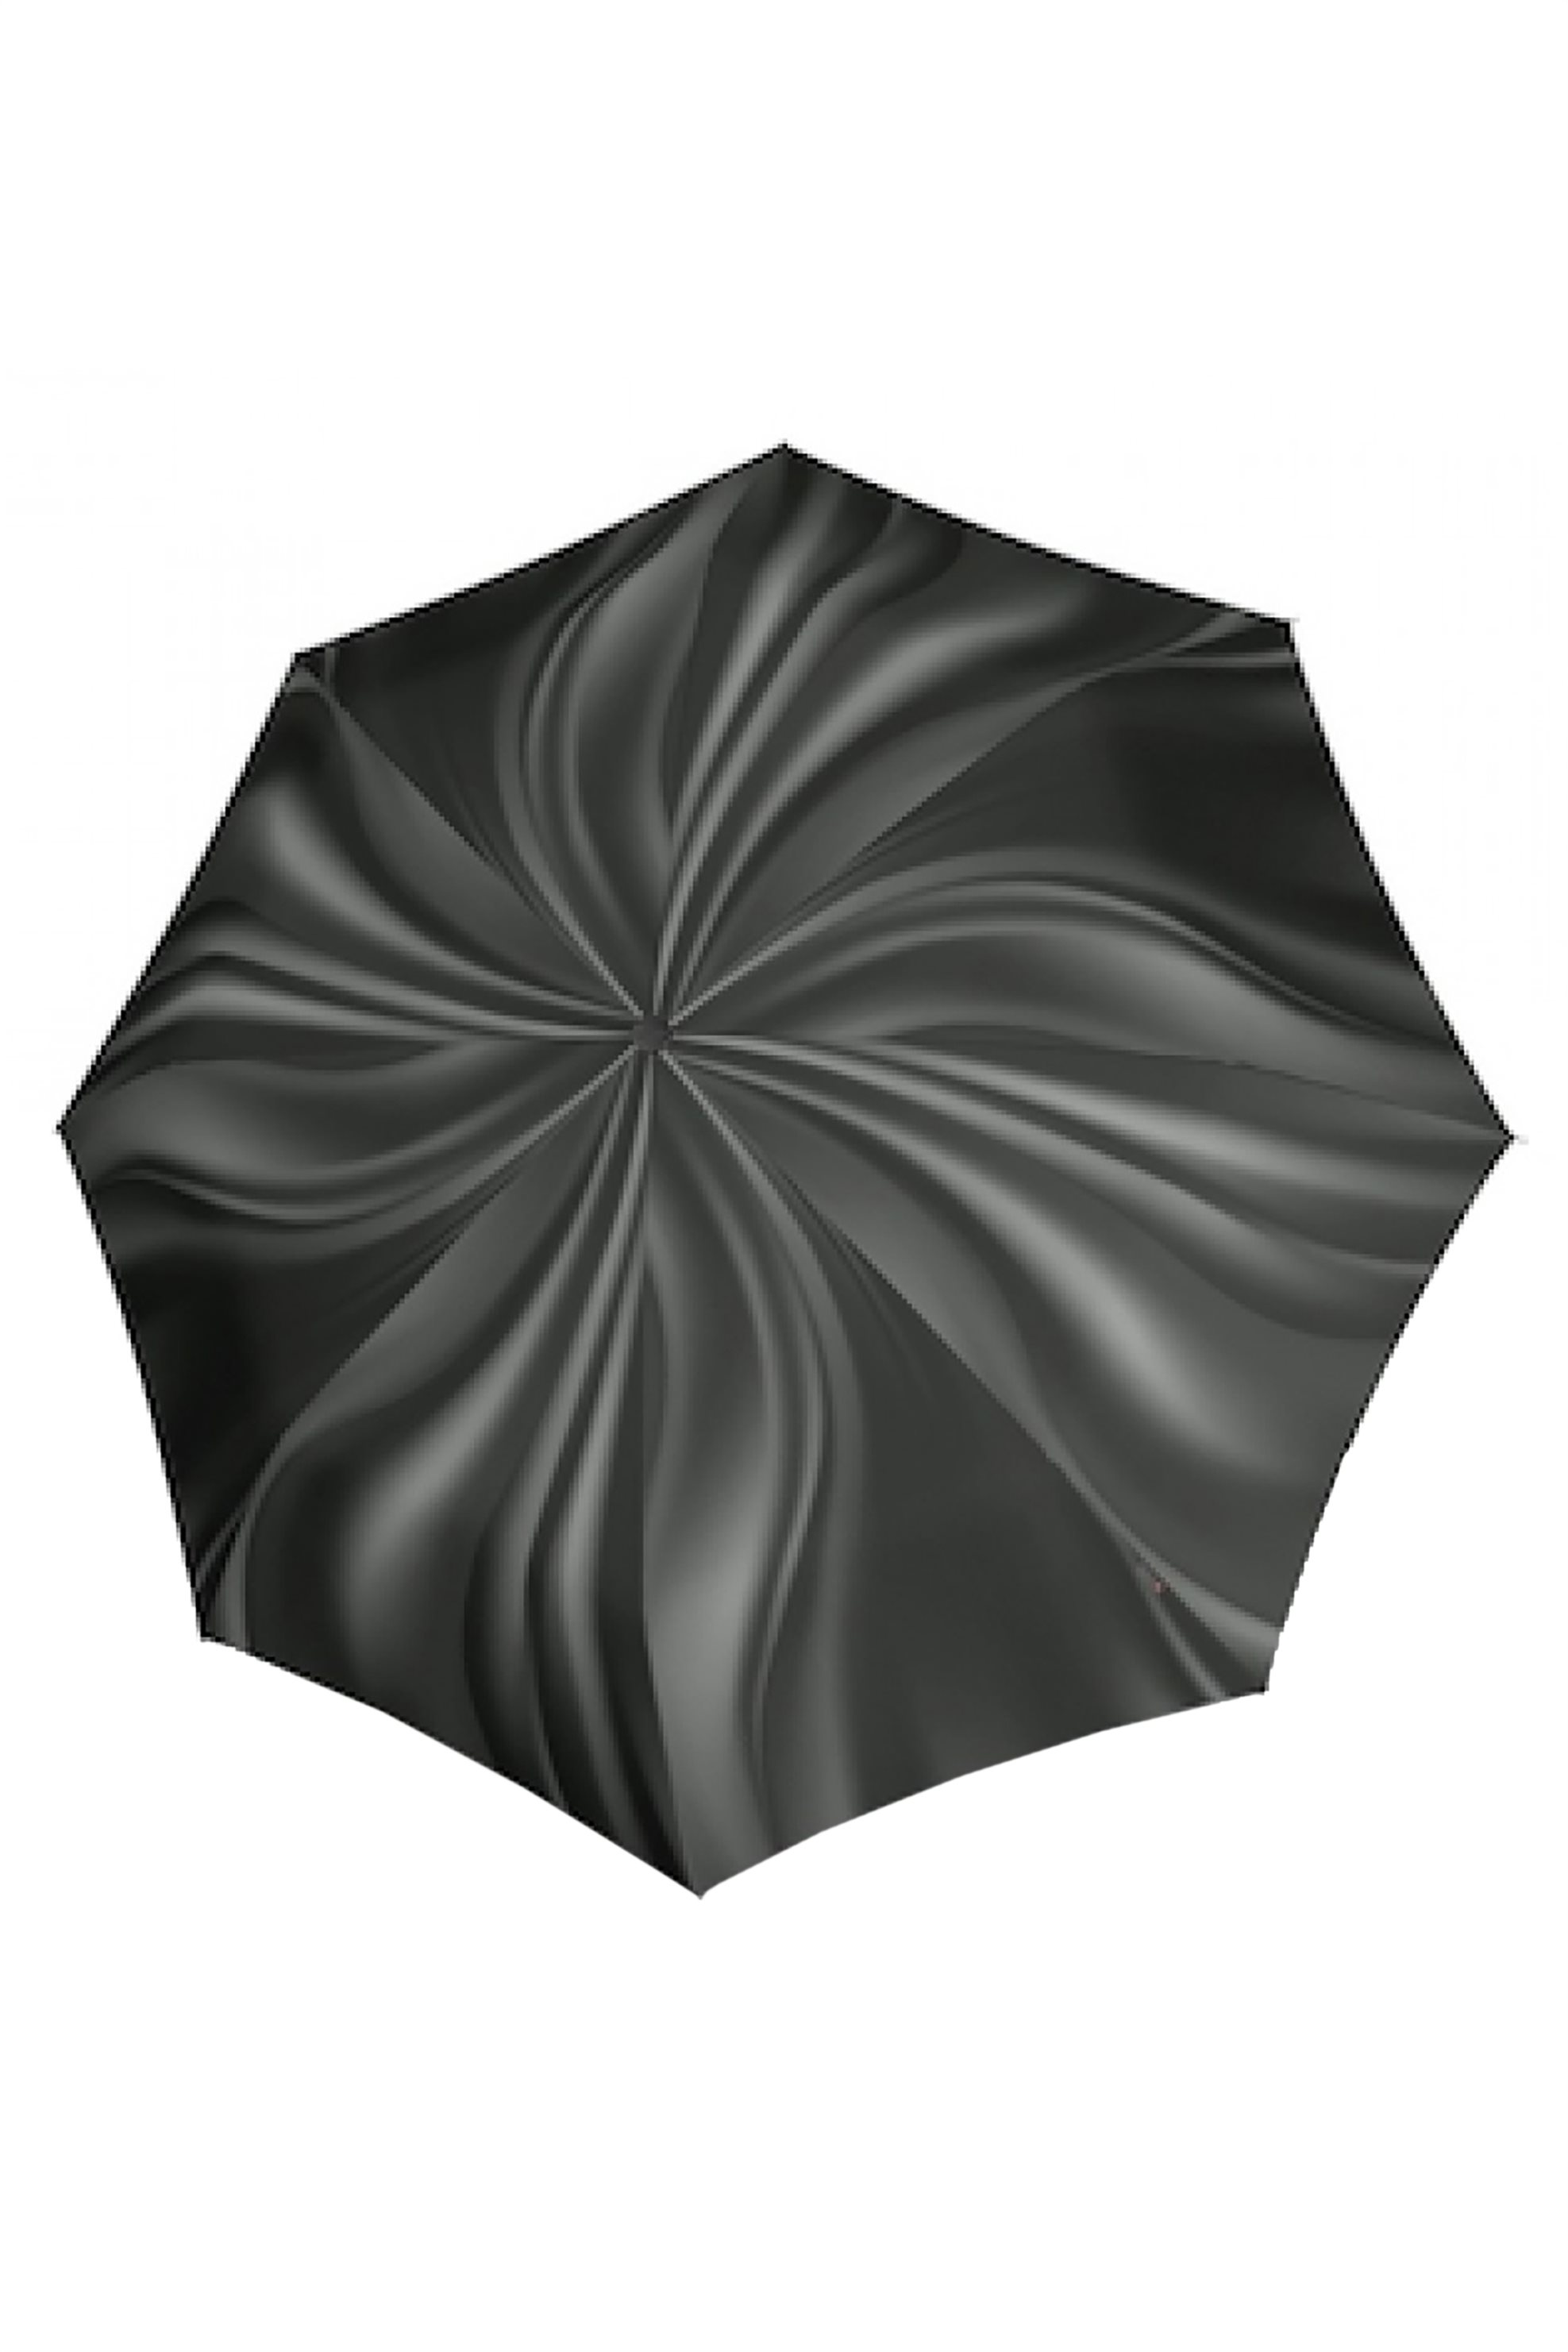 Knirps πτυσσόμενη ομπρέλα με print ''Duomatic'' - KNUM72008337